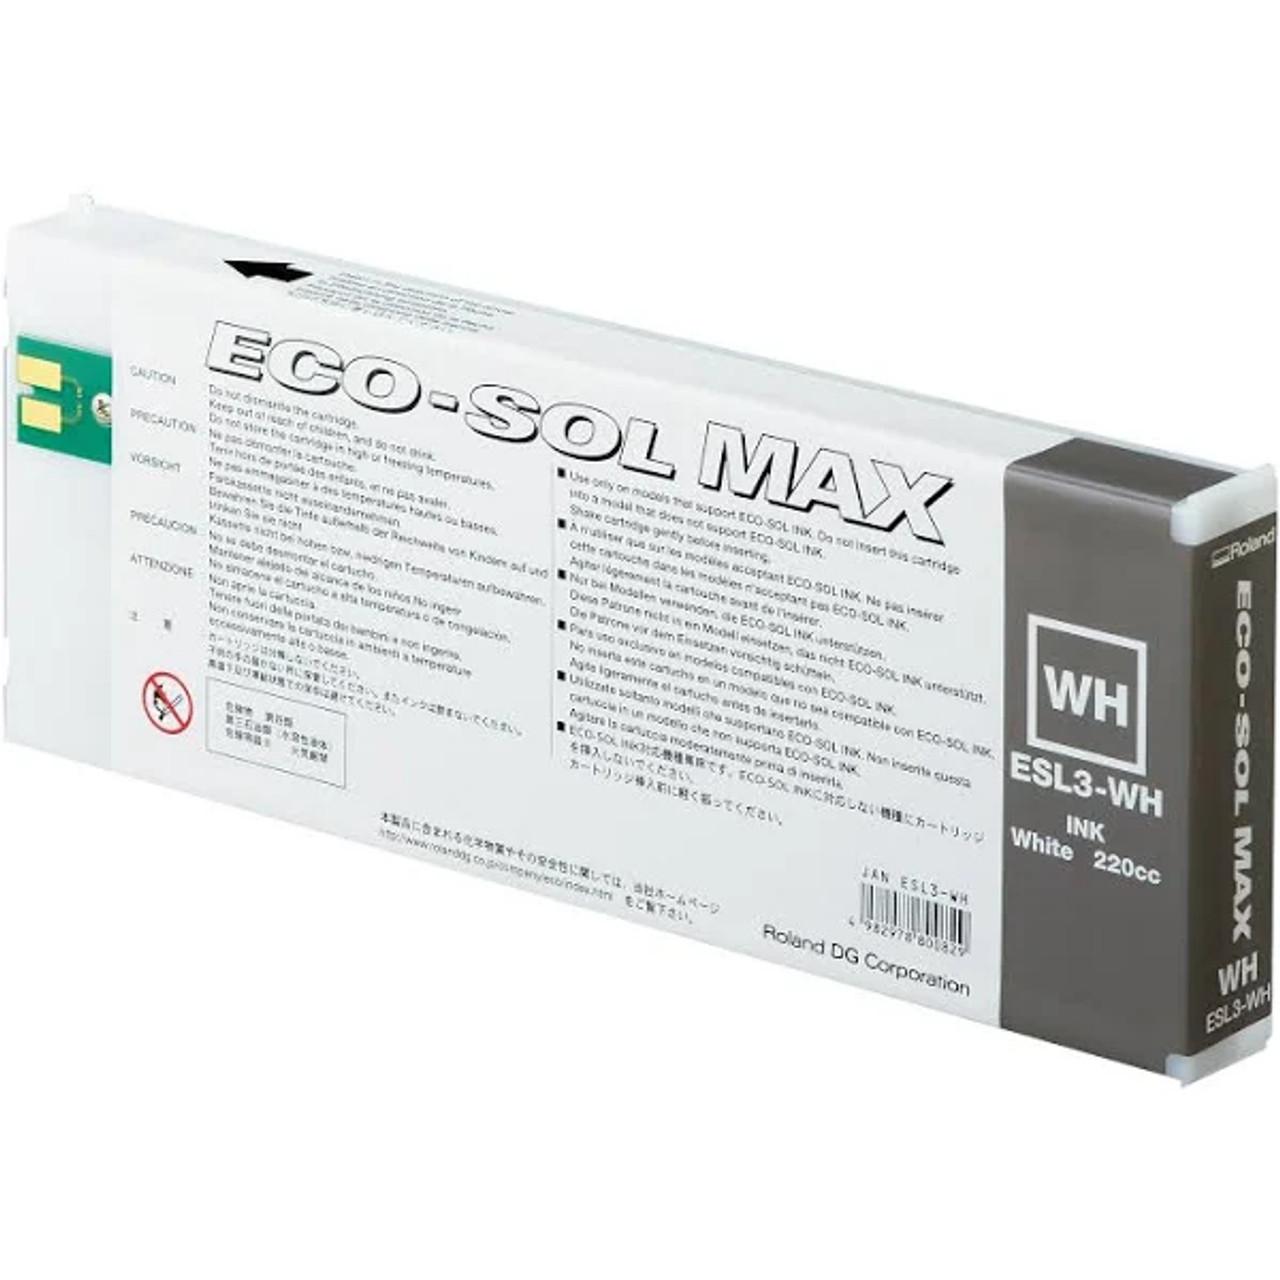 Roland Eco-Sol 220cc Ink White